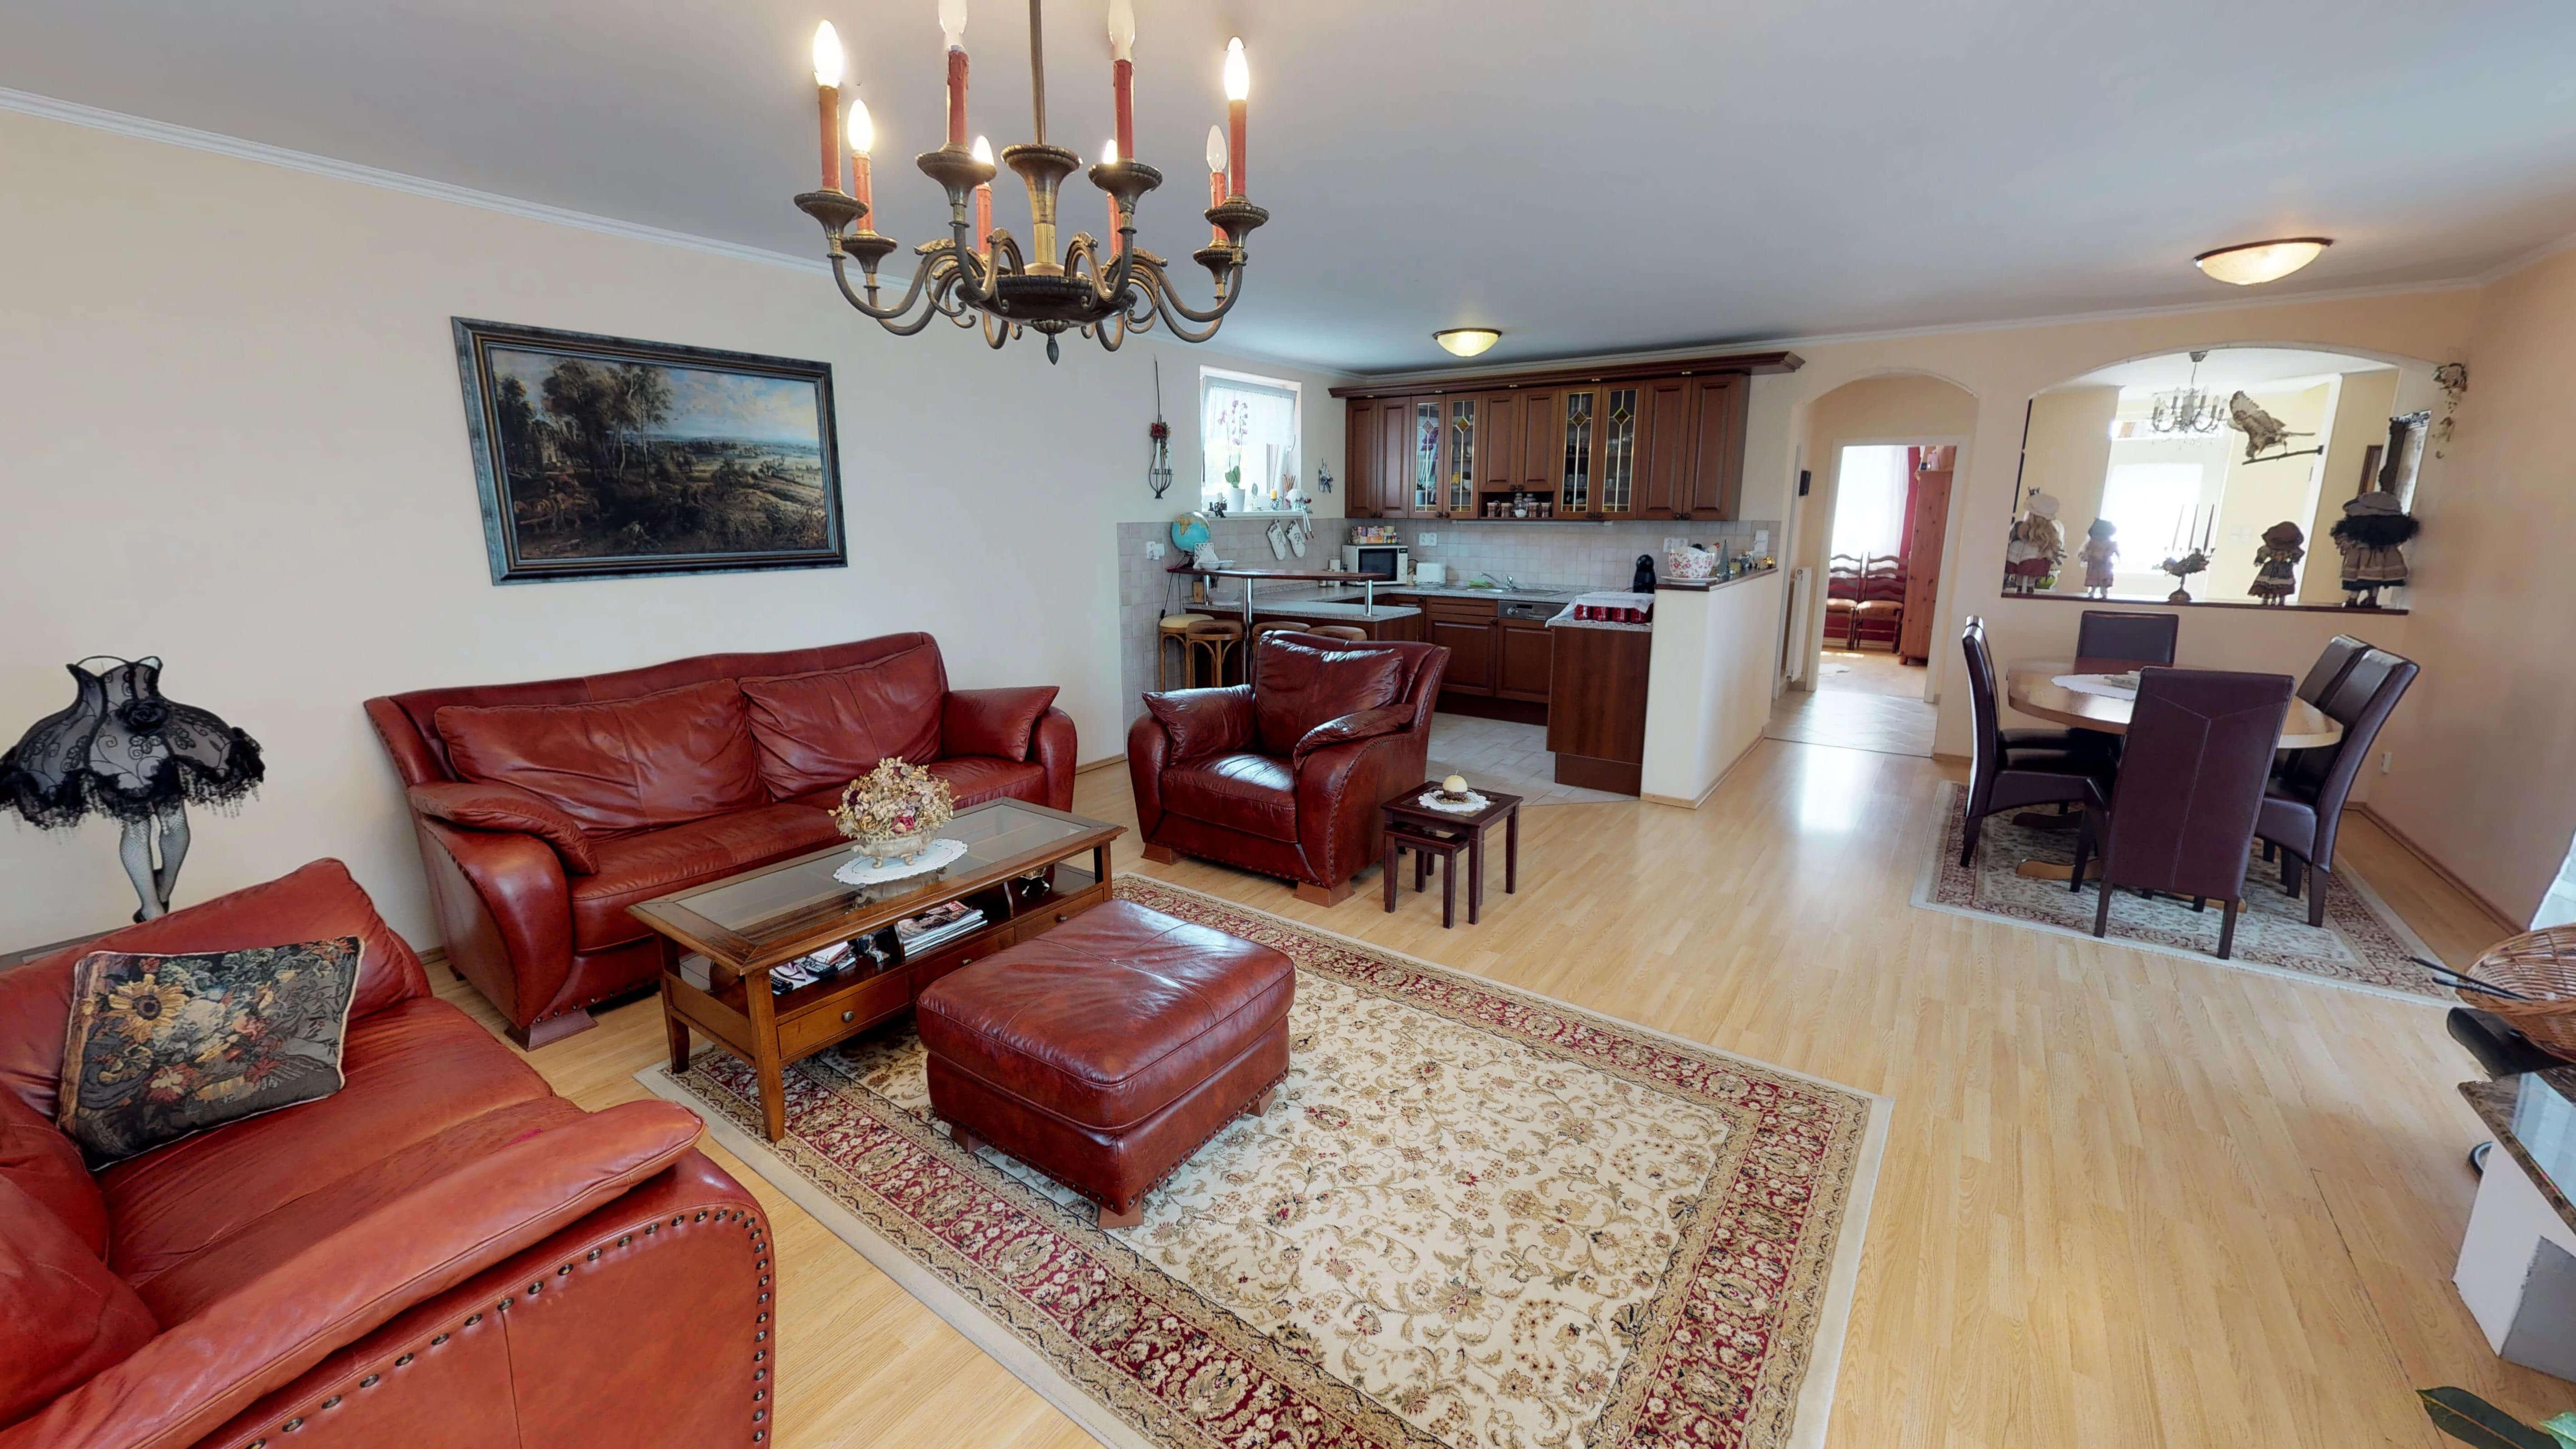 Rodinný dom na uzavretej ulici, Vojtechovce, 2 – generačný 6 izbový, úžitková 270m2, pozemok 600m2, garáž-2